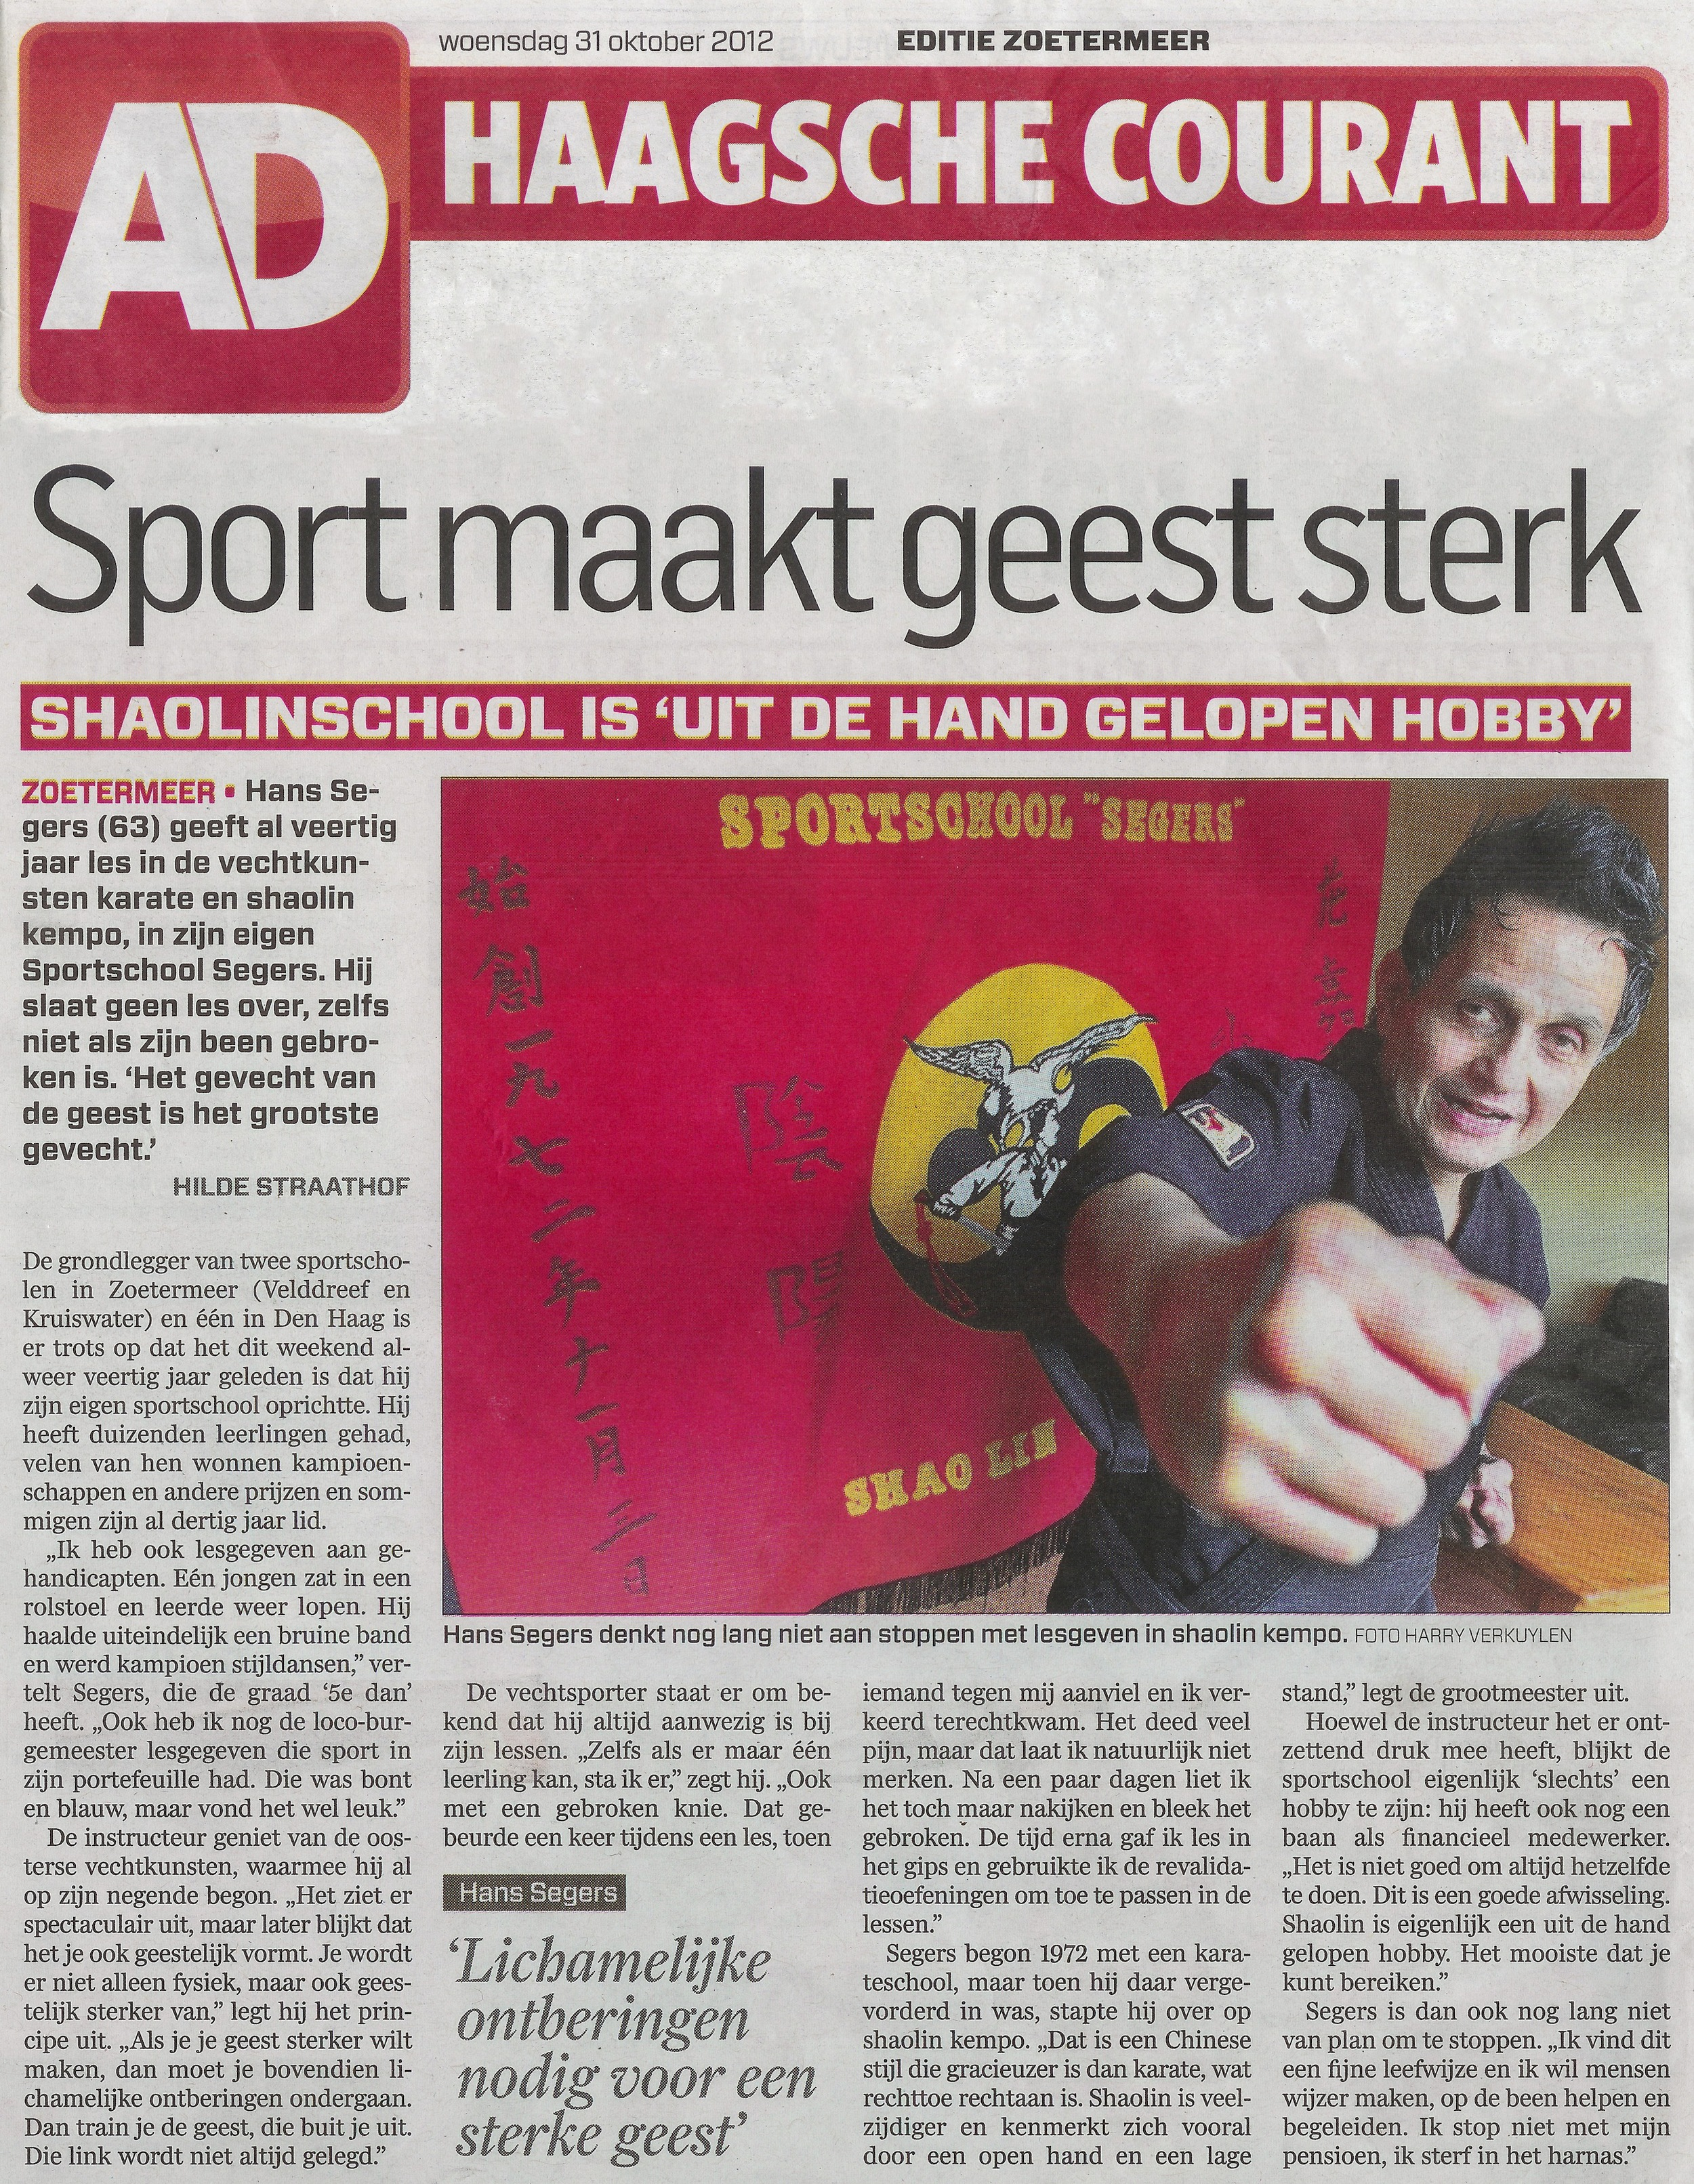 2012-10-31-ad-haagsche-courant-sport-maakt-geest-sterk.jpg